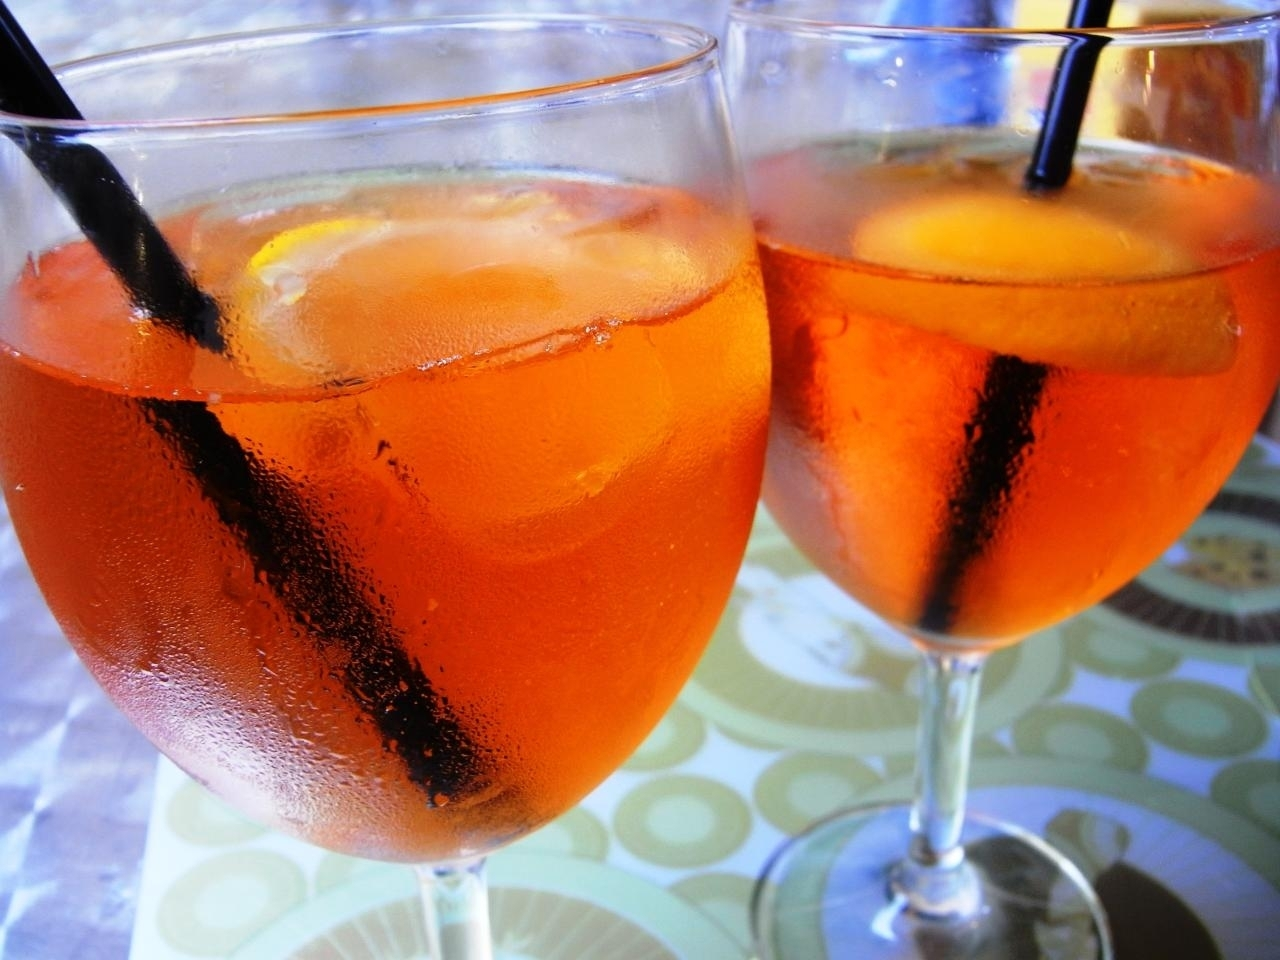 Aperol spritz martini vervemagazine for Bicchieri aperol spritz